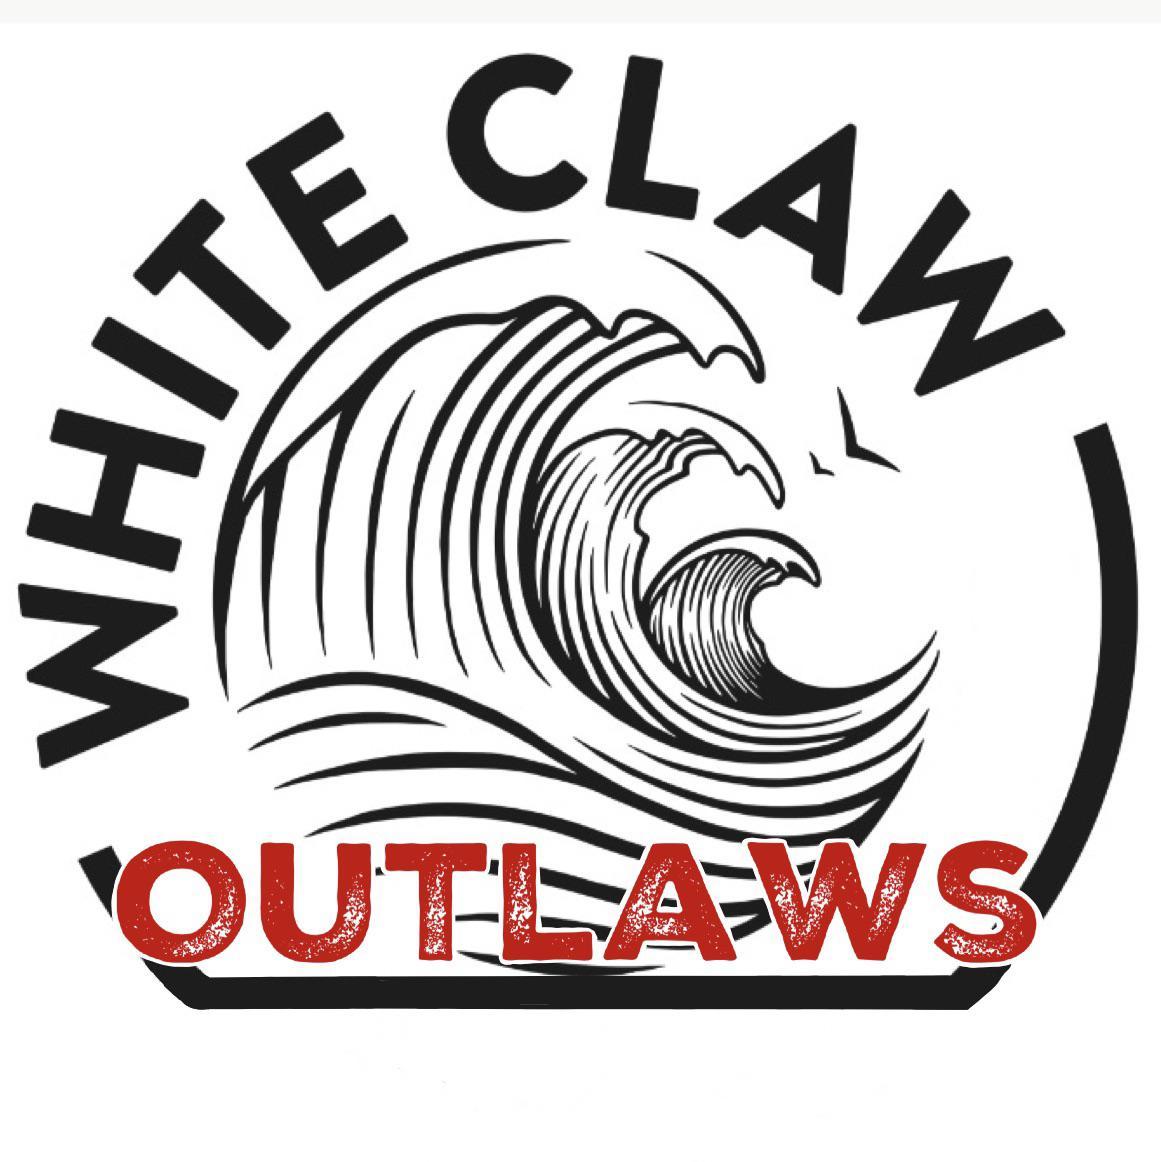 My fantasy football name and logo : WhiteClaw.